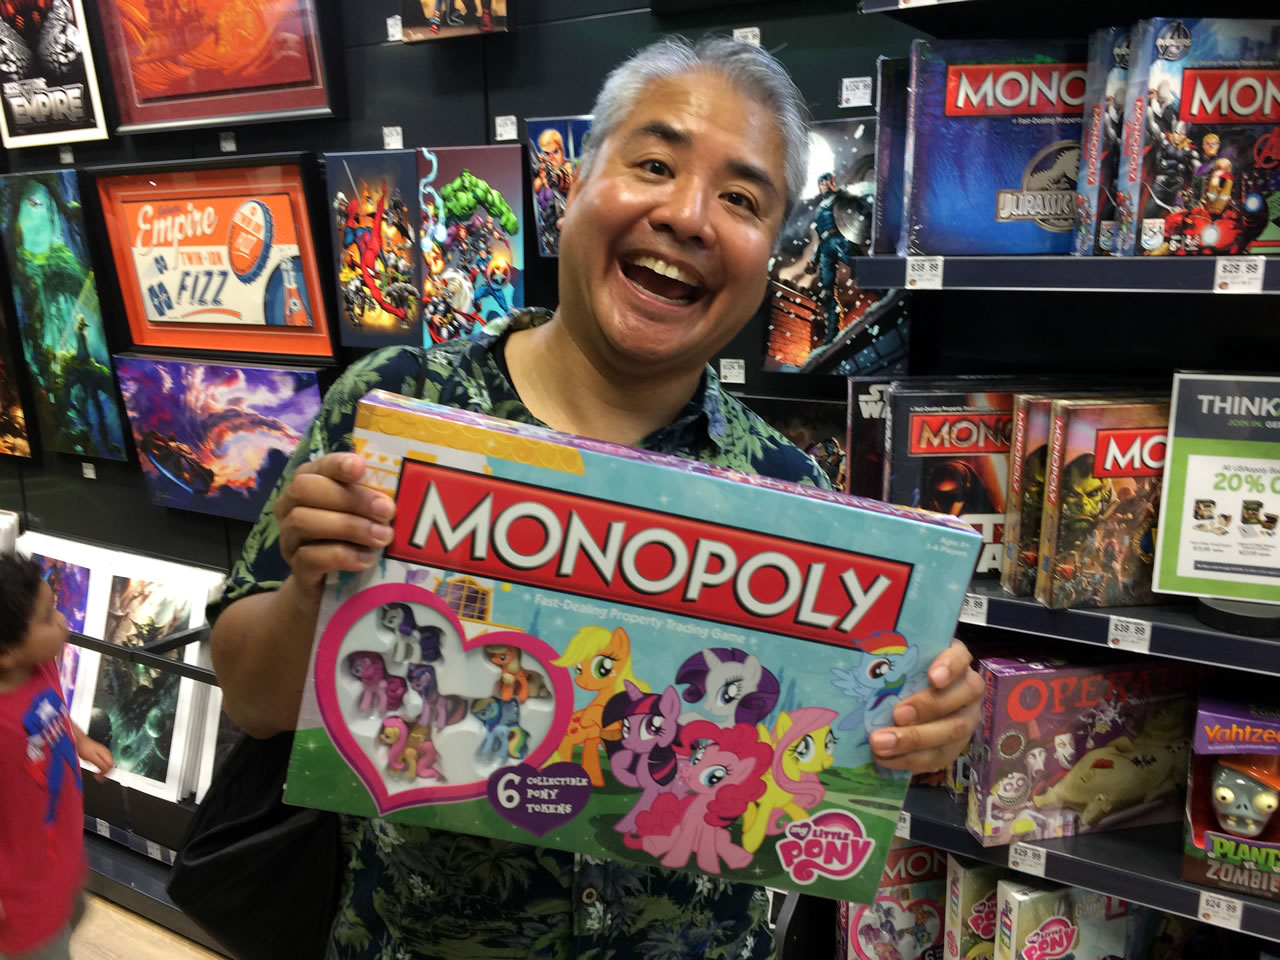 60 thinkgeek store - brony monopoly